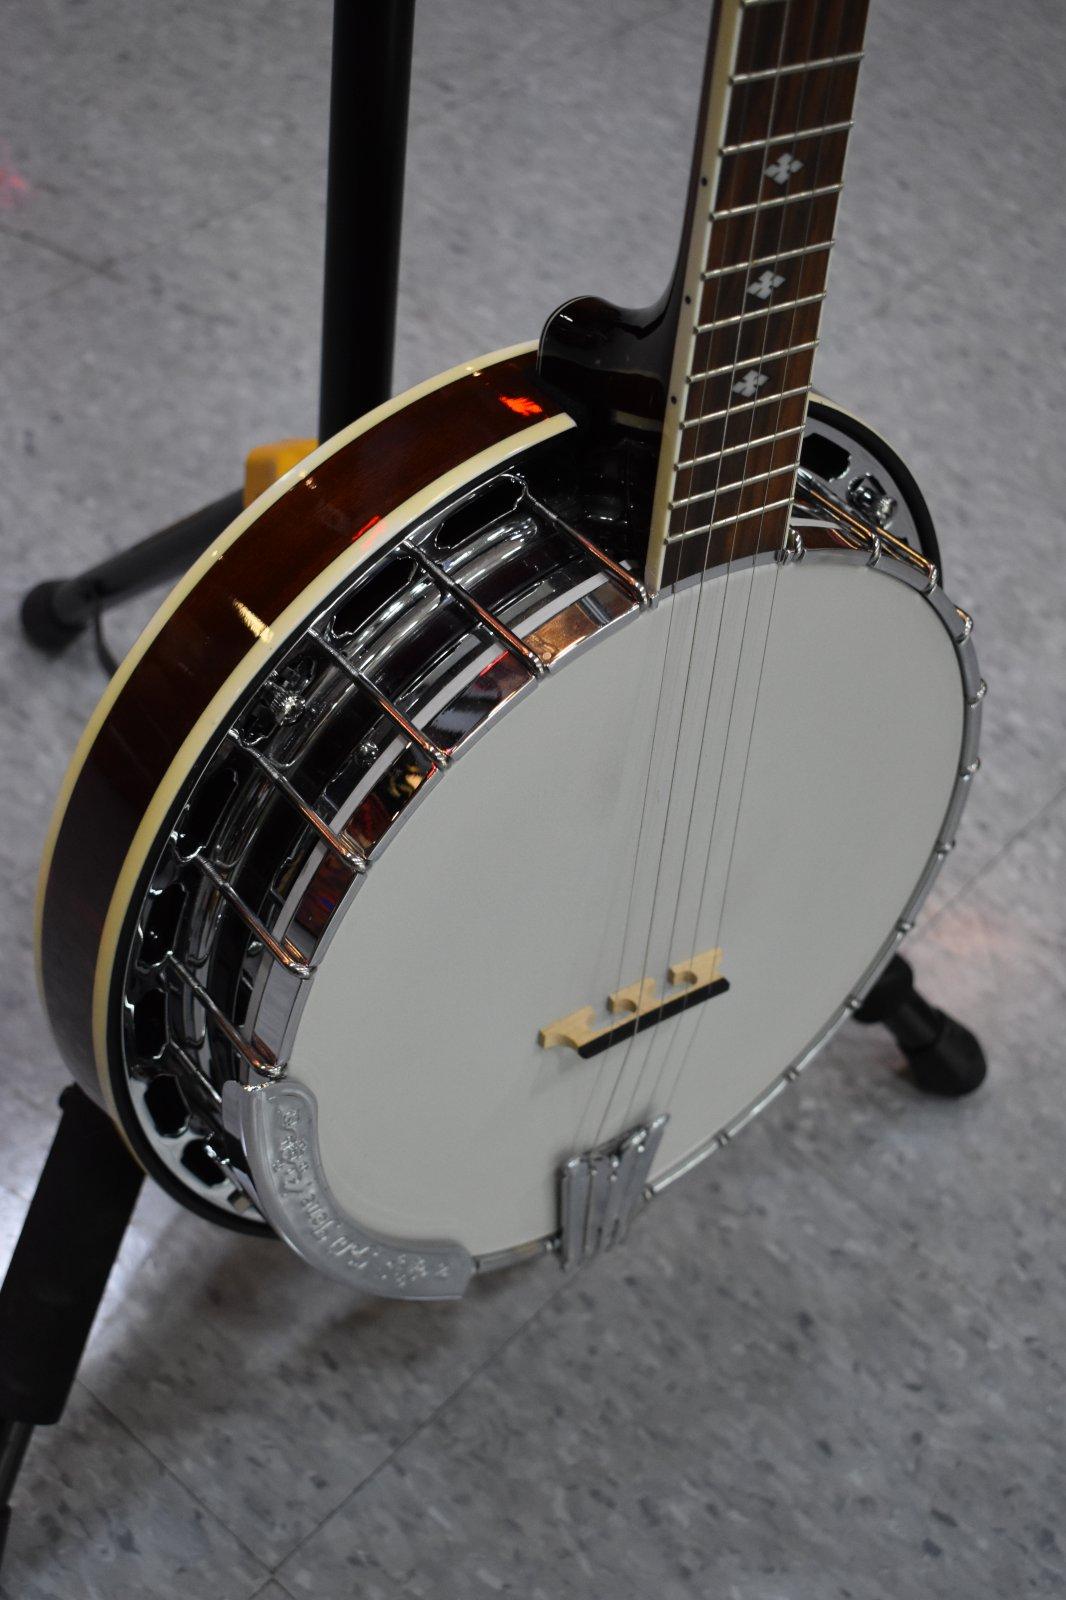 Used Gold Tone BG-250F Banjo